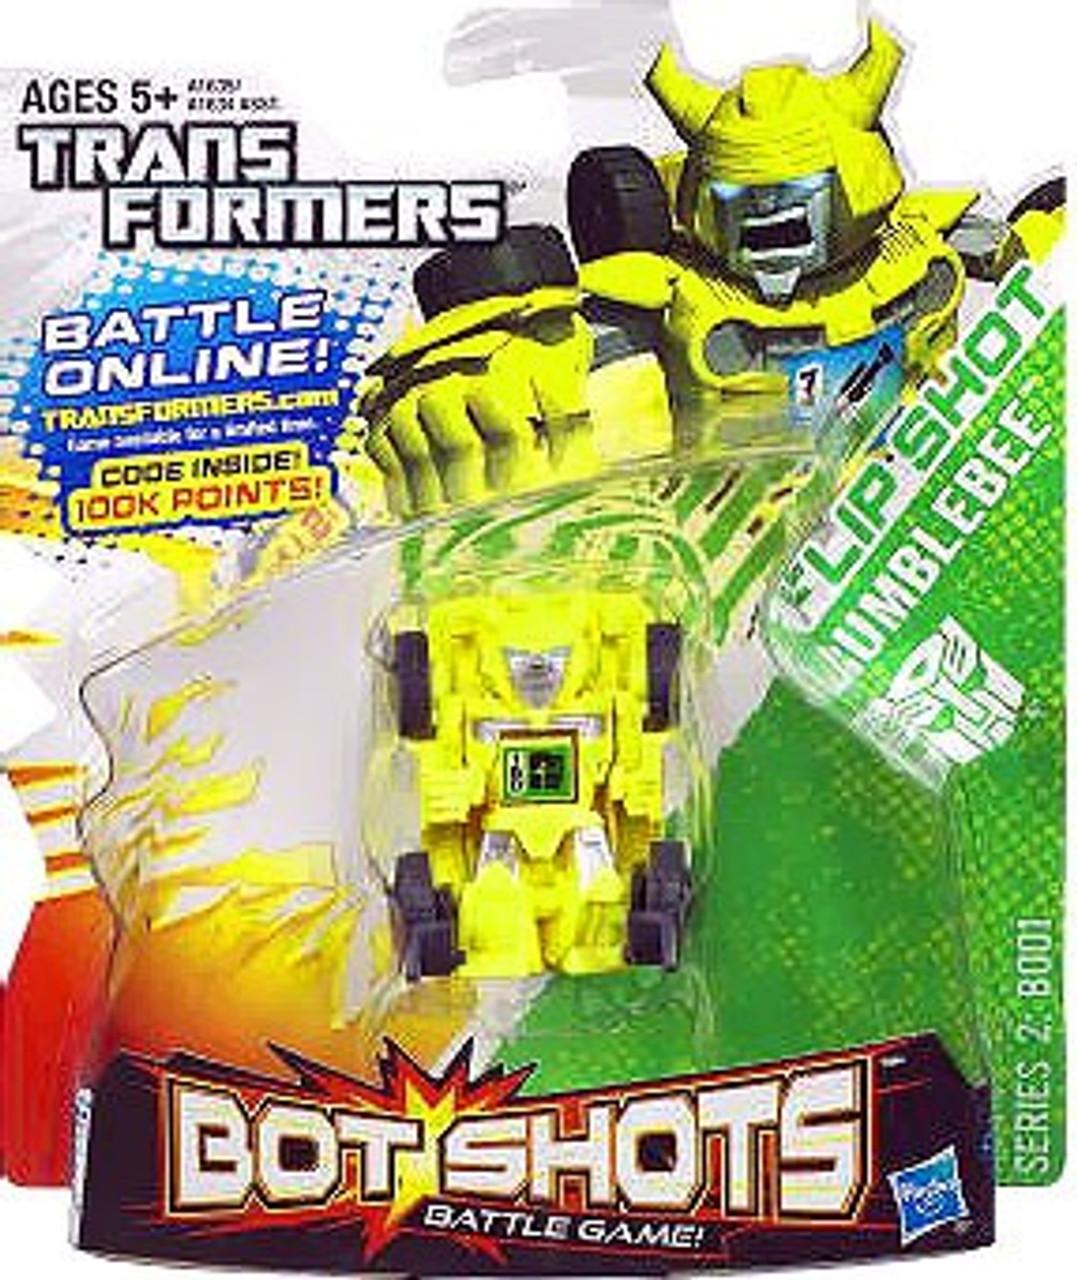 Transformers Bot Shots Battle Game Series 2 Flip Shot Bumblebee Action Figure